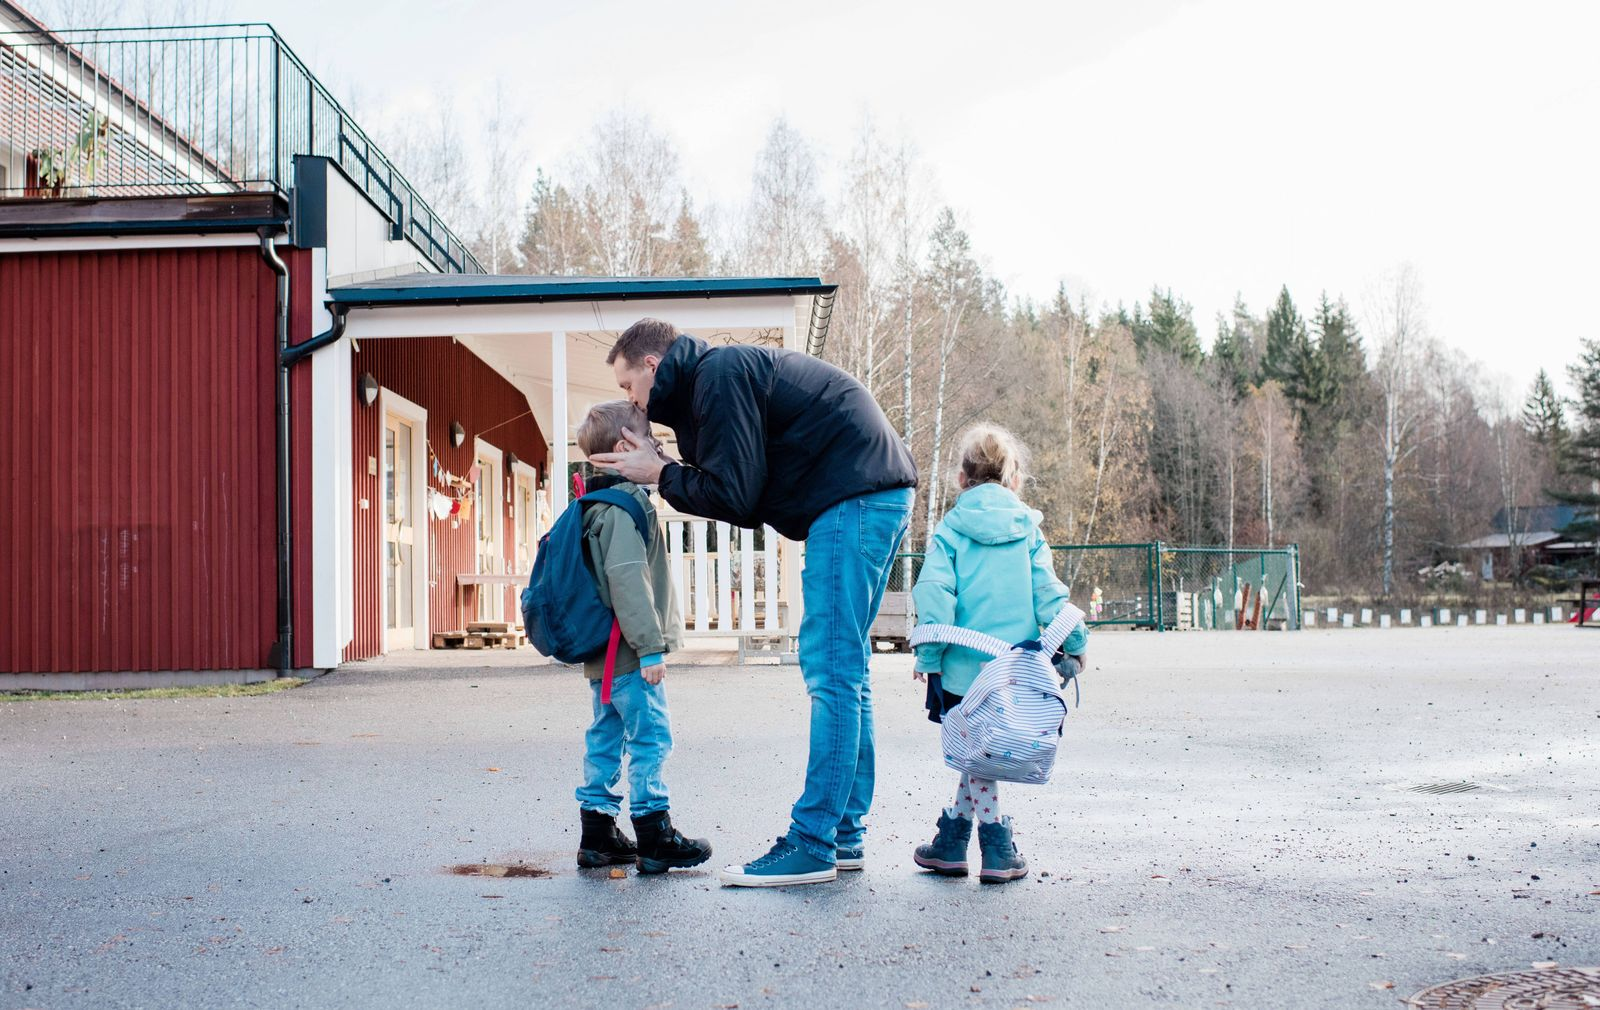 father kissing his kids goodbye at the school gates Norrtälje, Sweden PUBLICATIONxINxGERxSUIxAUTxONLY CR_RABE191115-2384